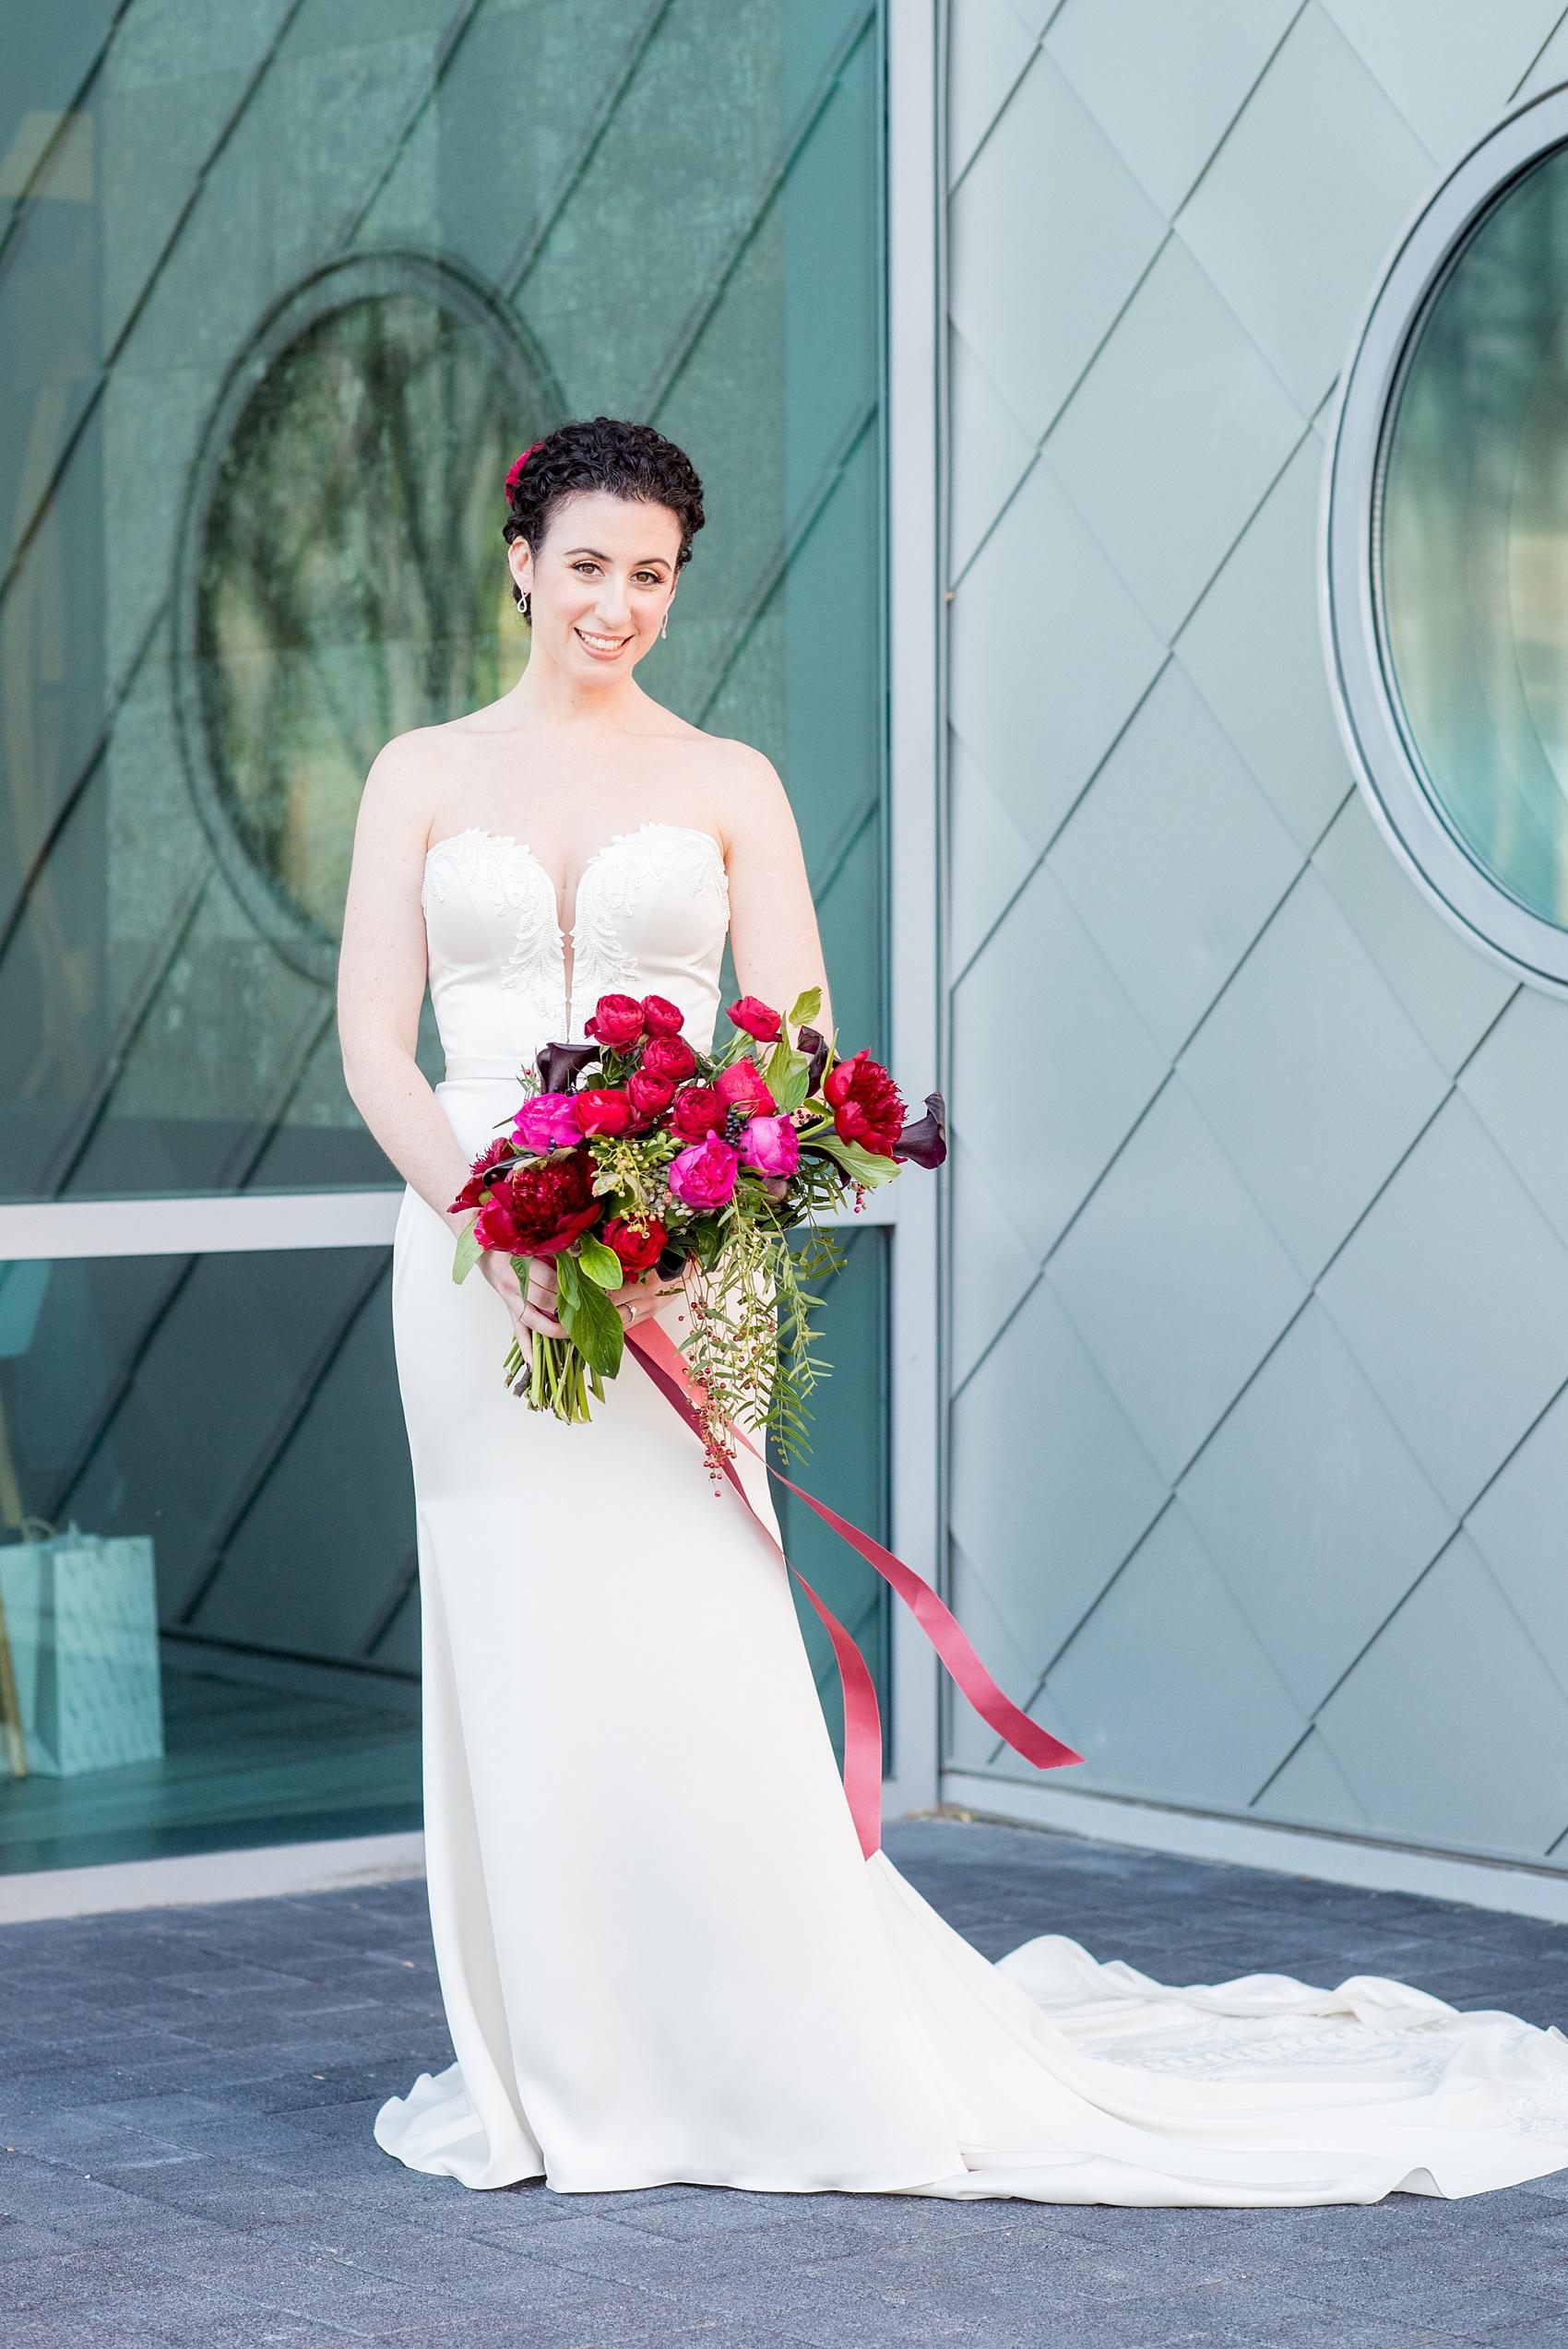 W Hoboken wedding photos with a Manhattan Skyline view